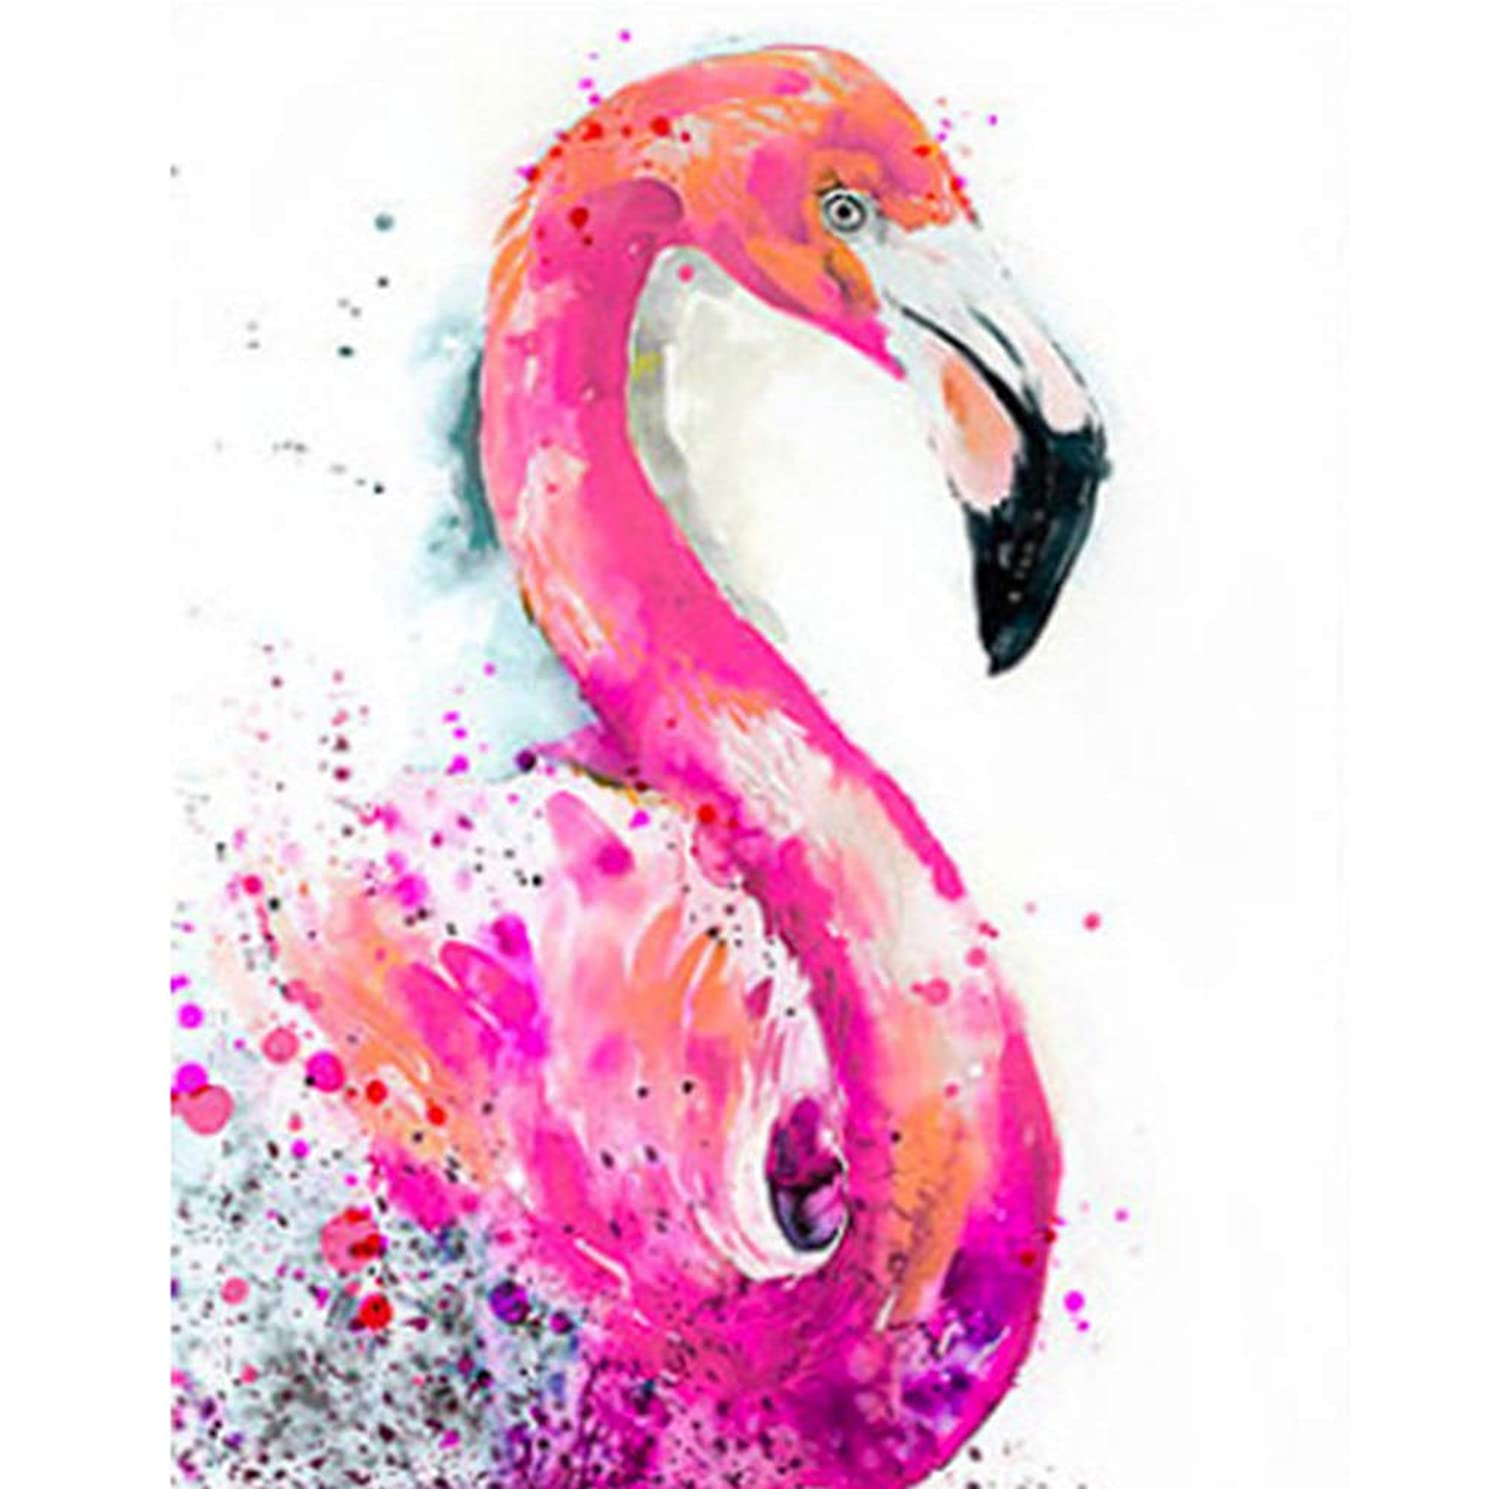 TZADDH DIY 5D Diamond Painting Kits Full Drill MoTZADDH DIY 5D Diamond Painting Kits Full Drill Mosaic Diamond Embroidery, Flamingosaic Diamond Embroidery, Flamingo (style6, 20x25cm)